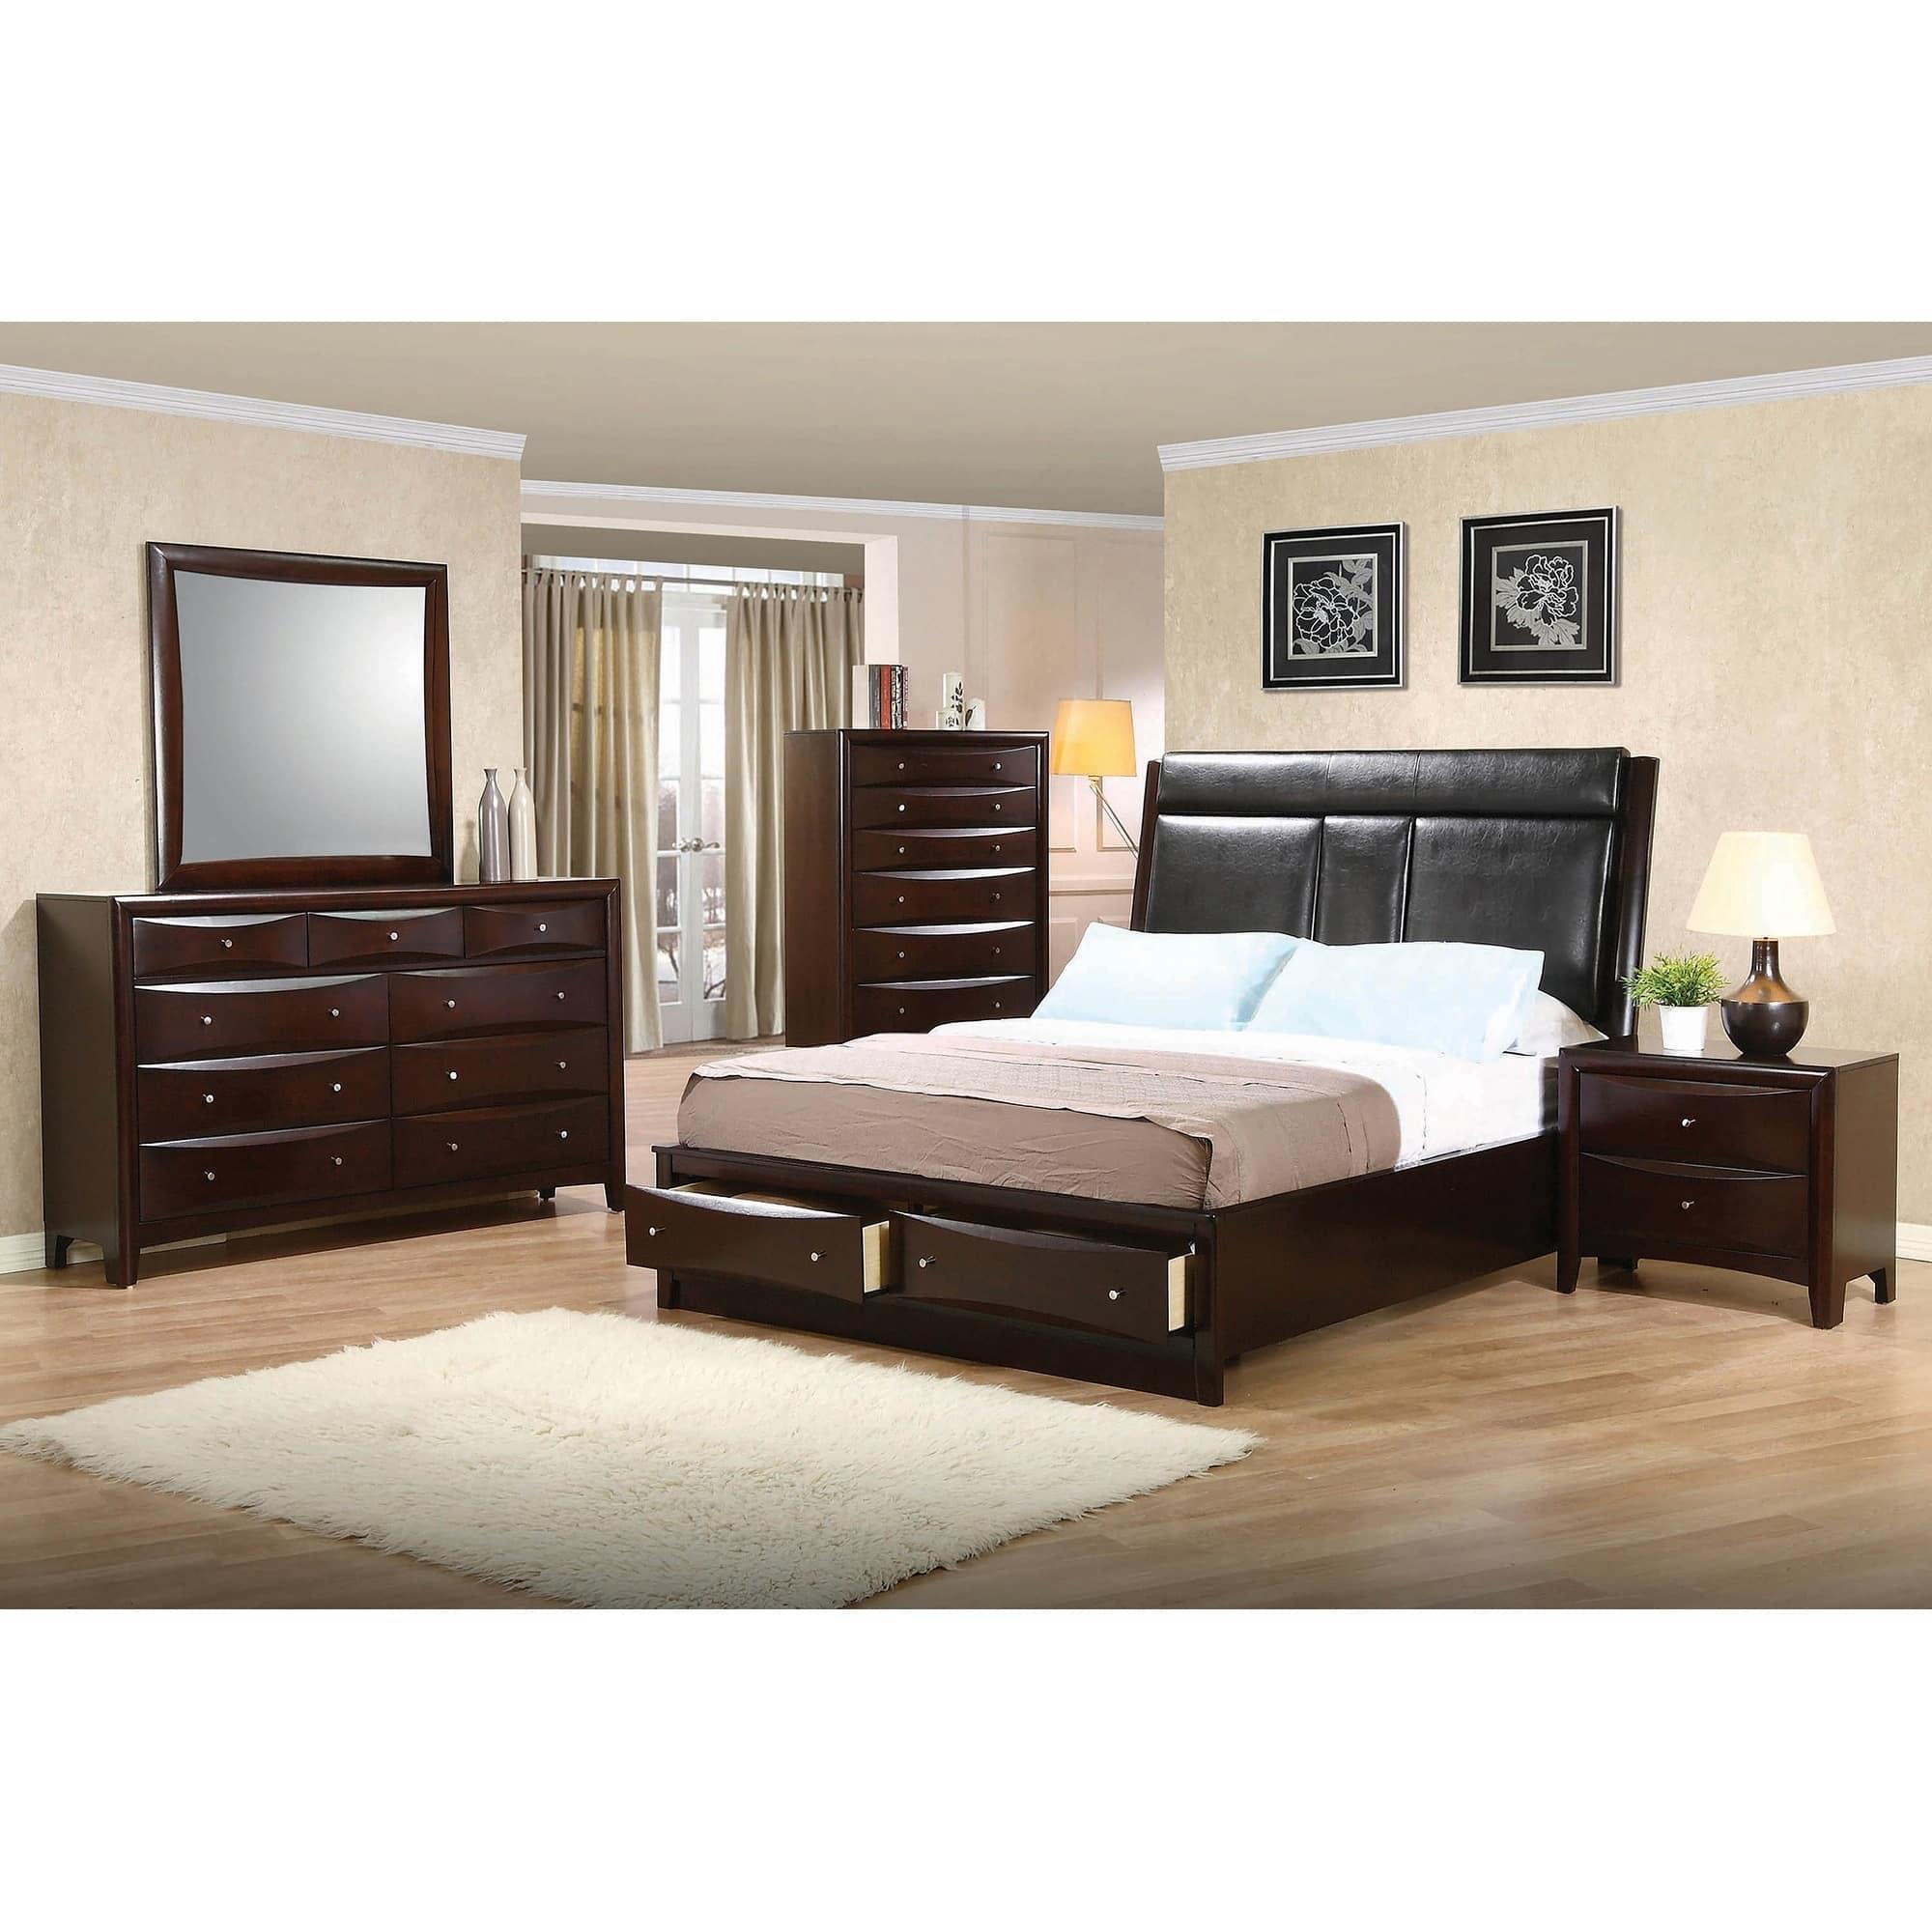 Home Goods Bedroom Furniture: Buy Bedroom Sets Online At Overstock